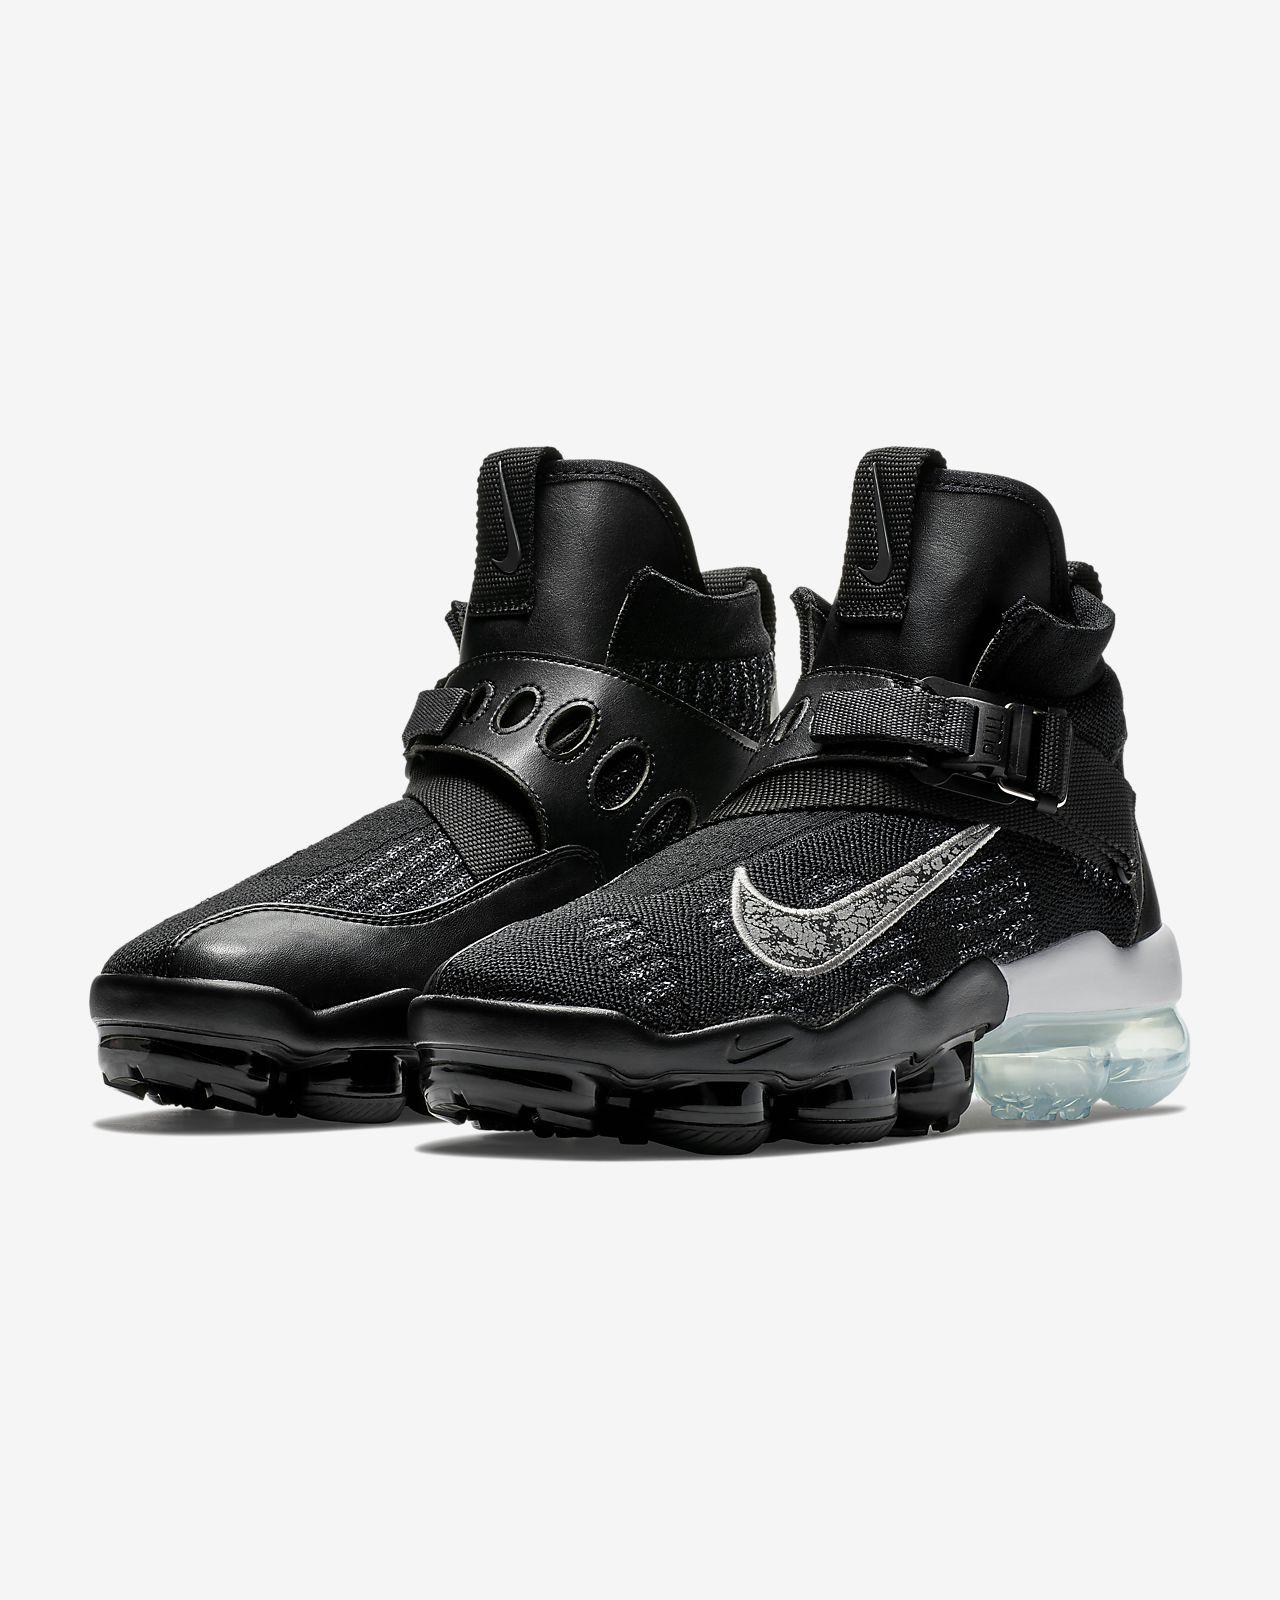 a5a88d4a28f0 Nike Air VaporMax Premier Flyknit Men s Shoe. Nike.com CA